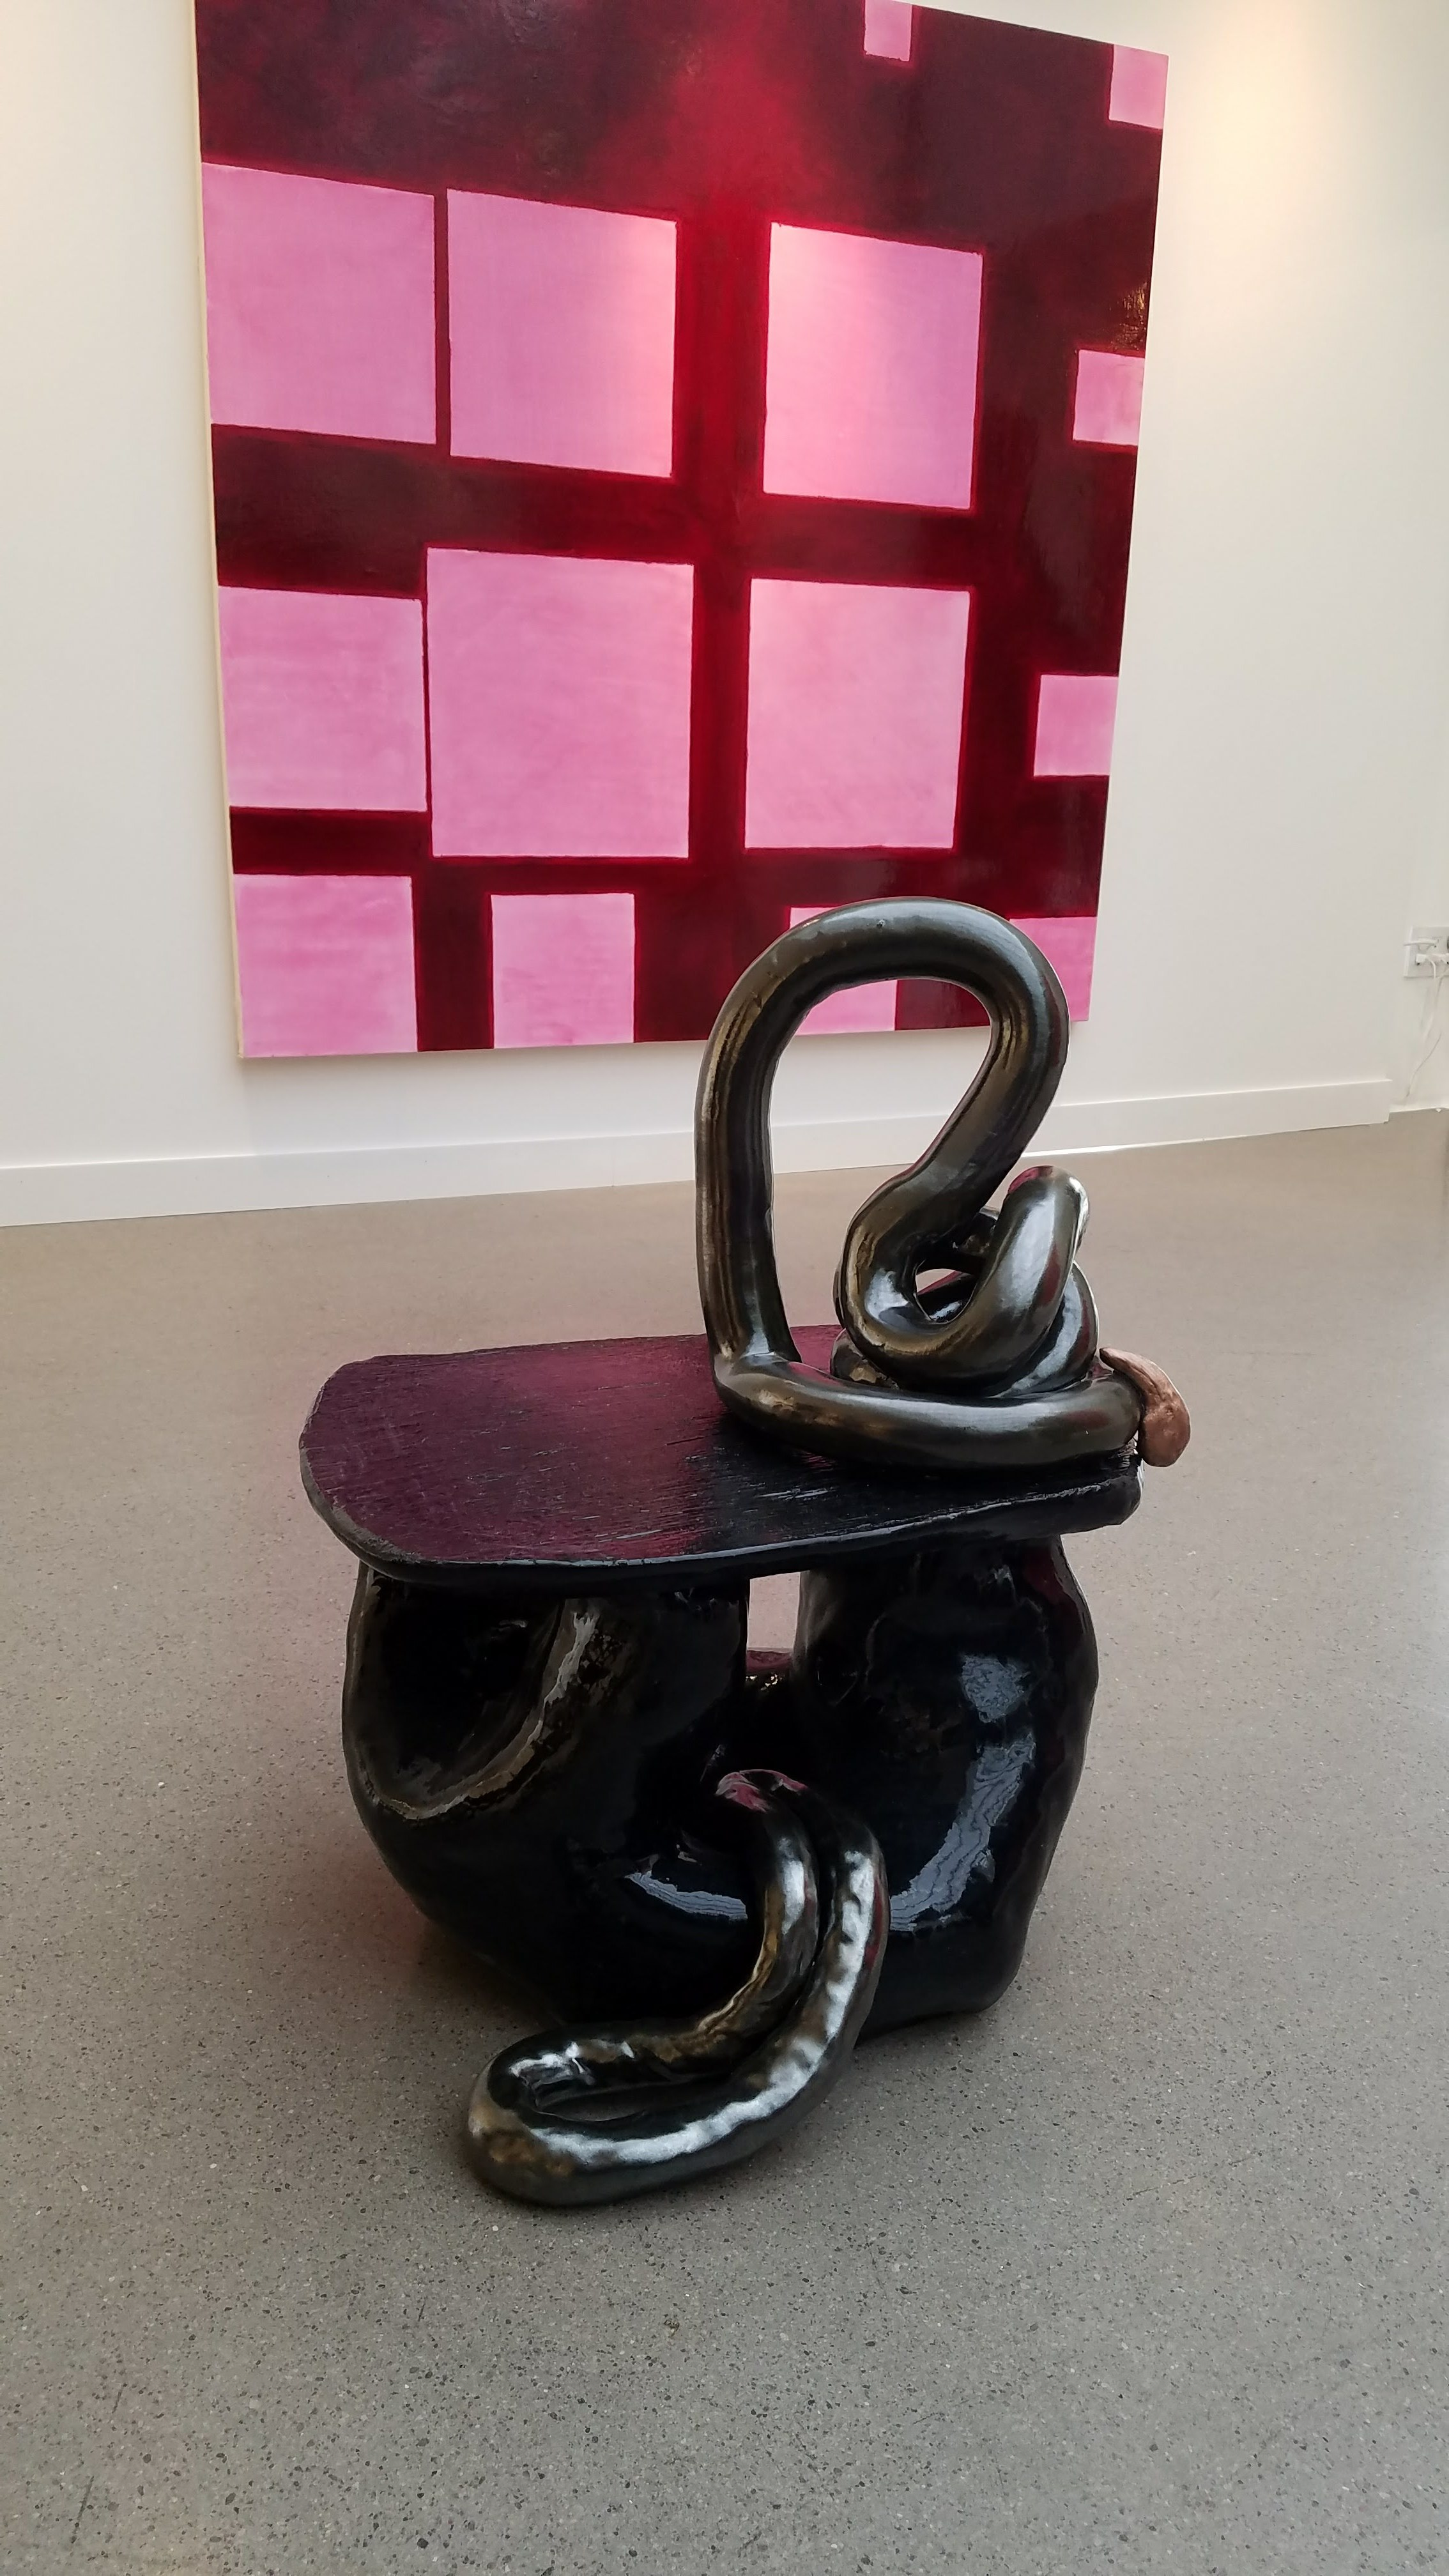 Lauren Nauman courtesy of J. Lohmann Gallery